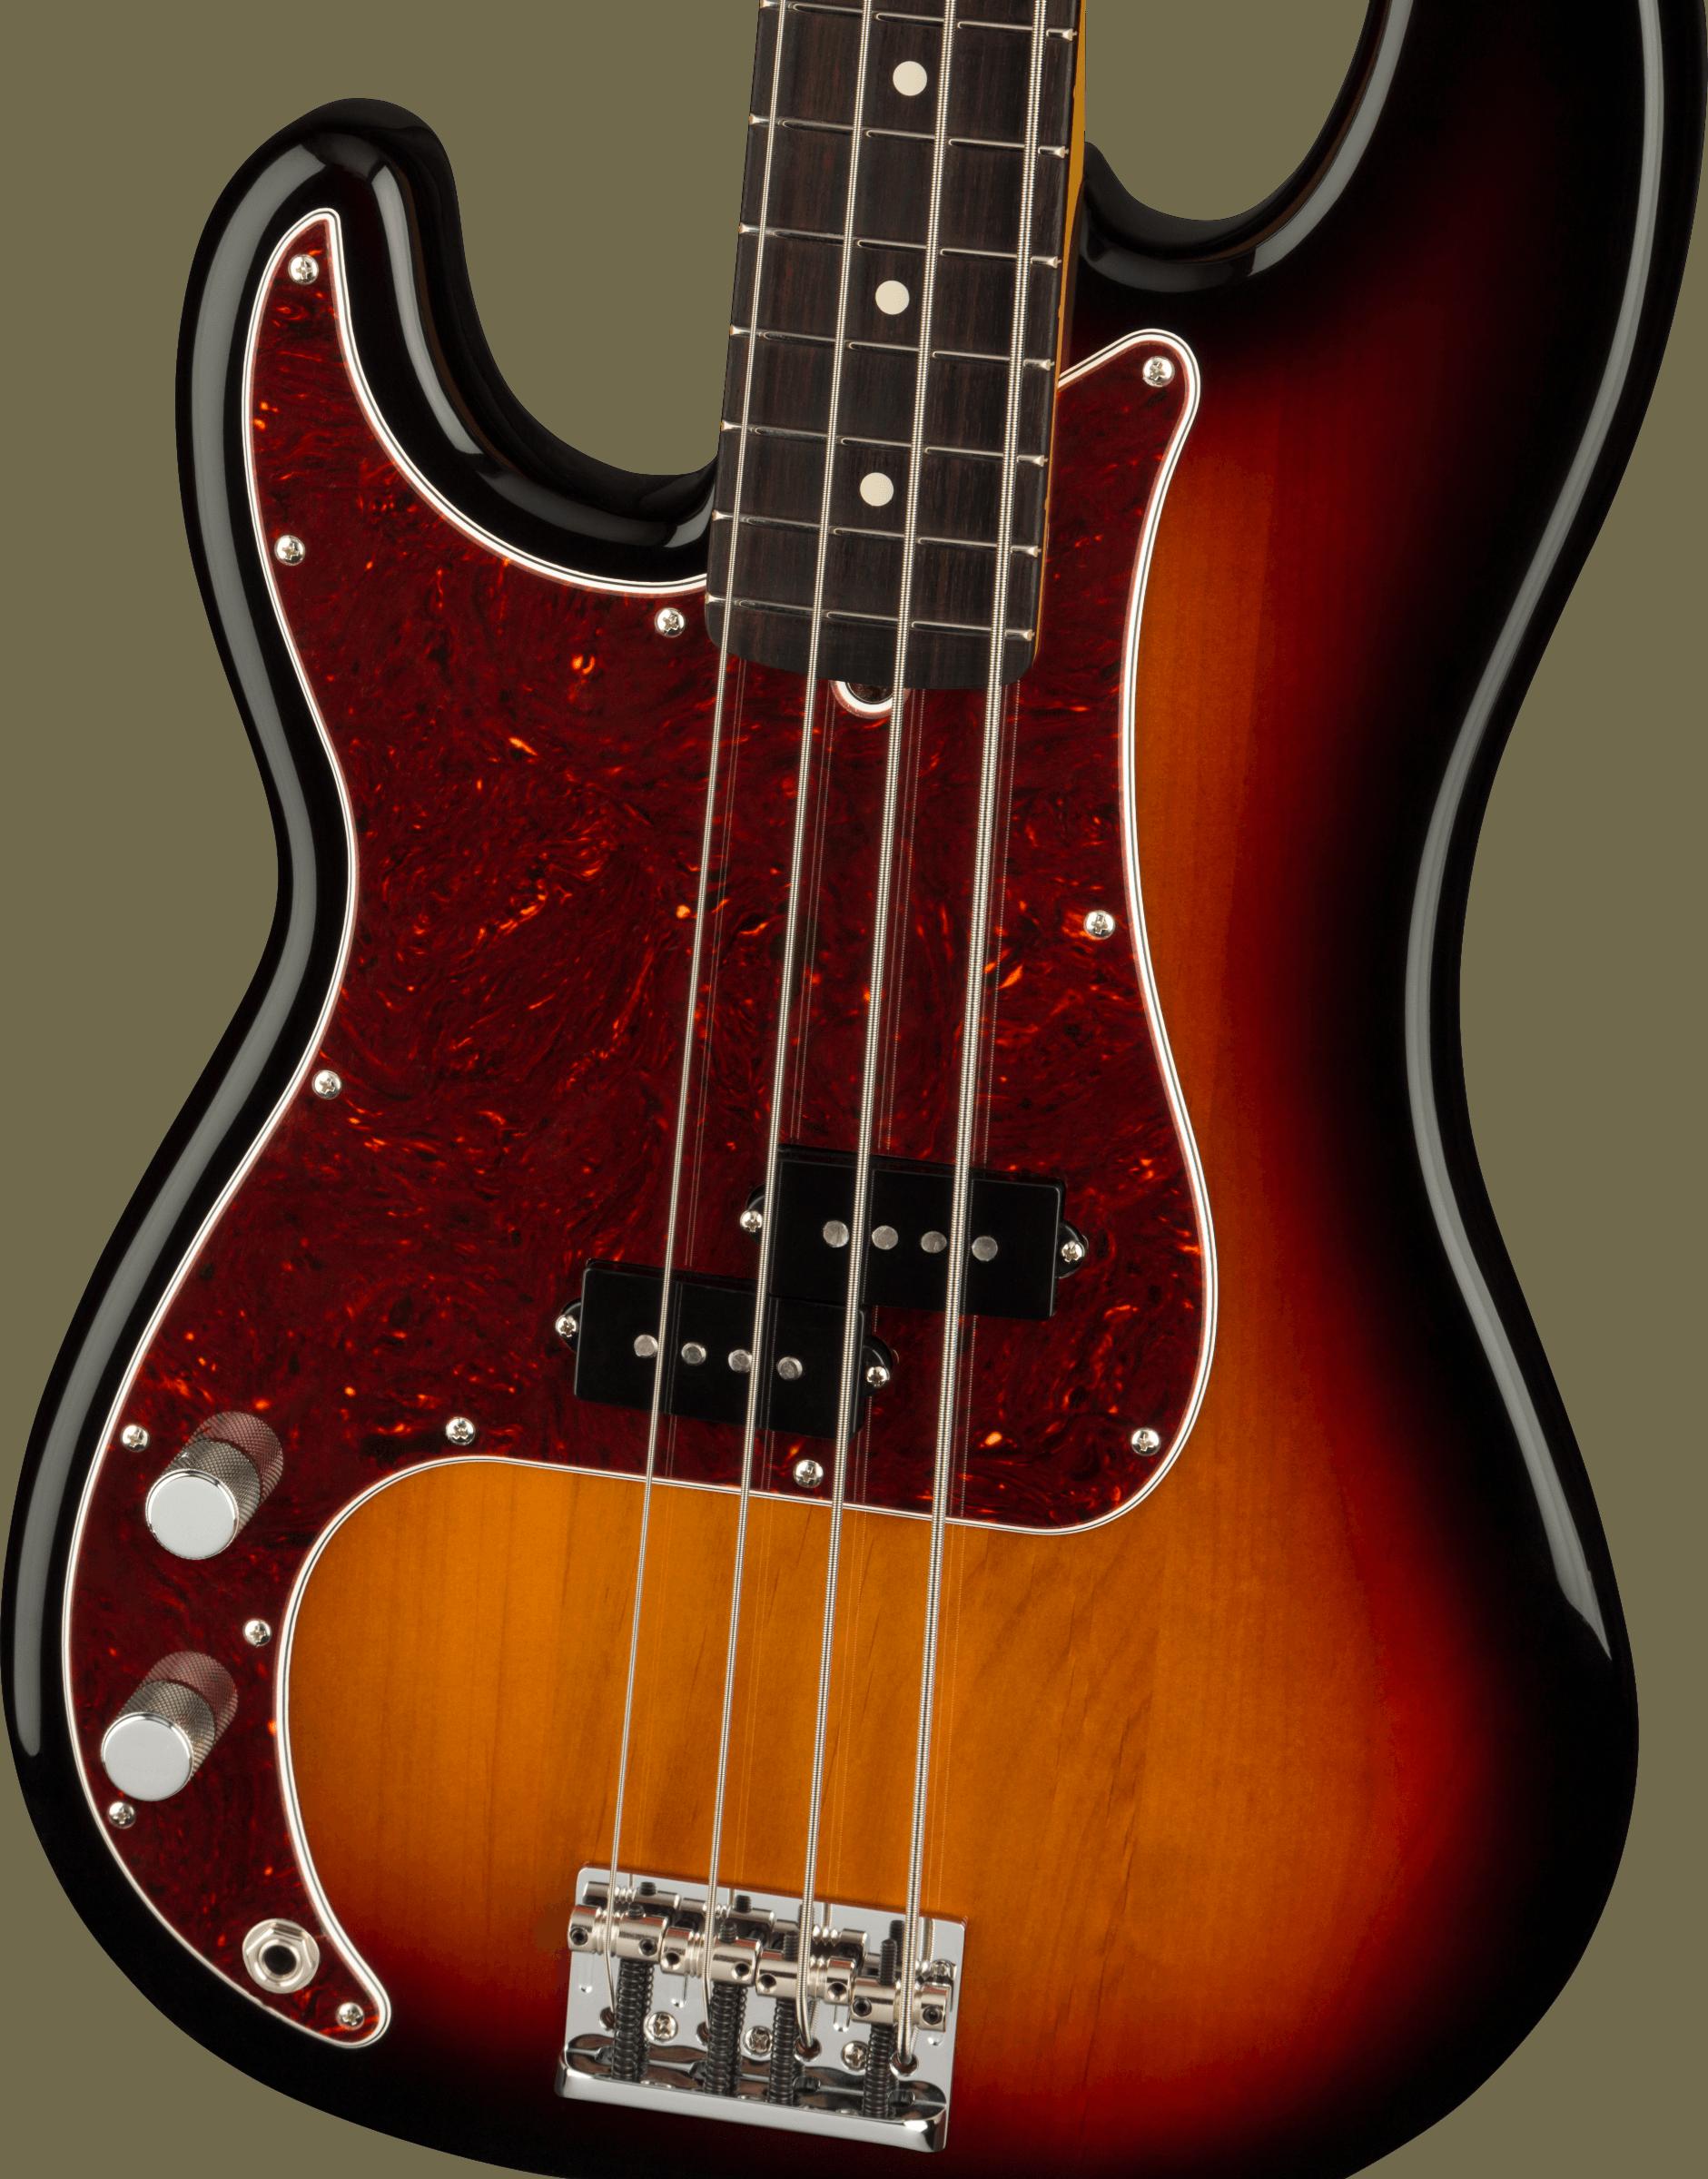 Fender American Professional II Precision Bass® Left-Hand, Rosewood Fingerboard, 3-Color Sunburst